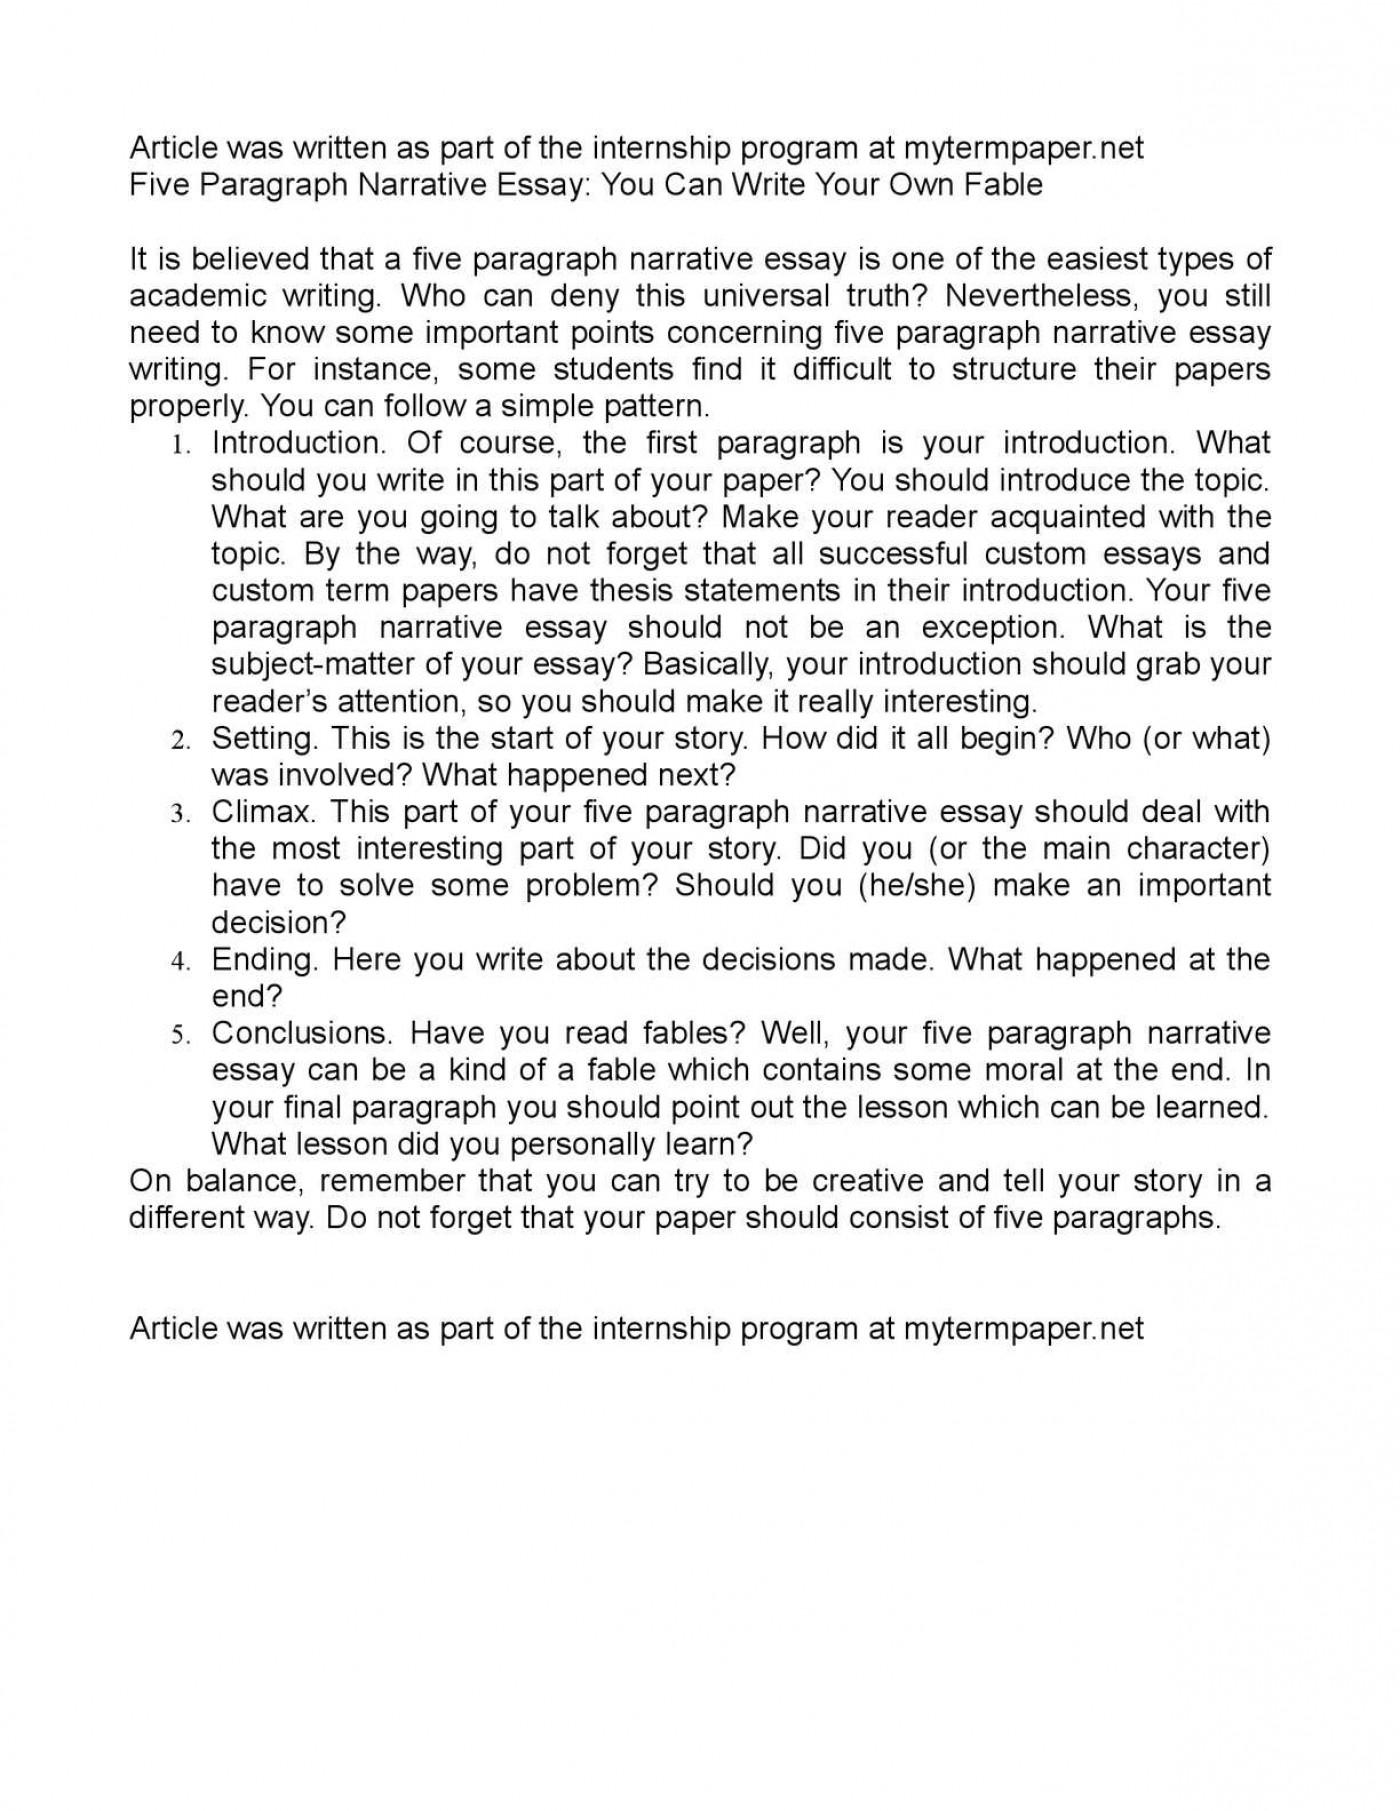 002 Paragraph Essay Example College Do Essays Have To Paragraphs Calam Eacute O Five Paragra Excellent 5 Pdf 1400